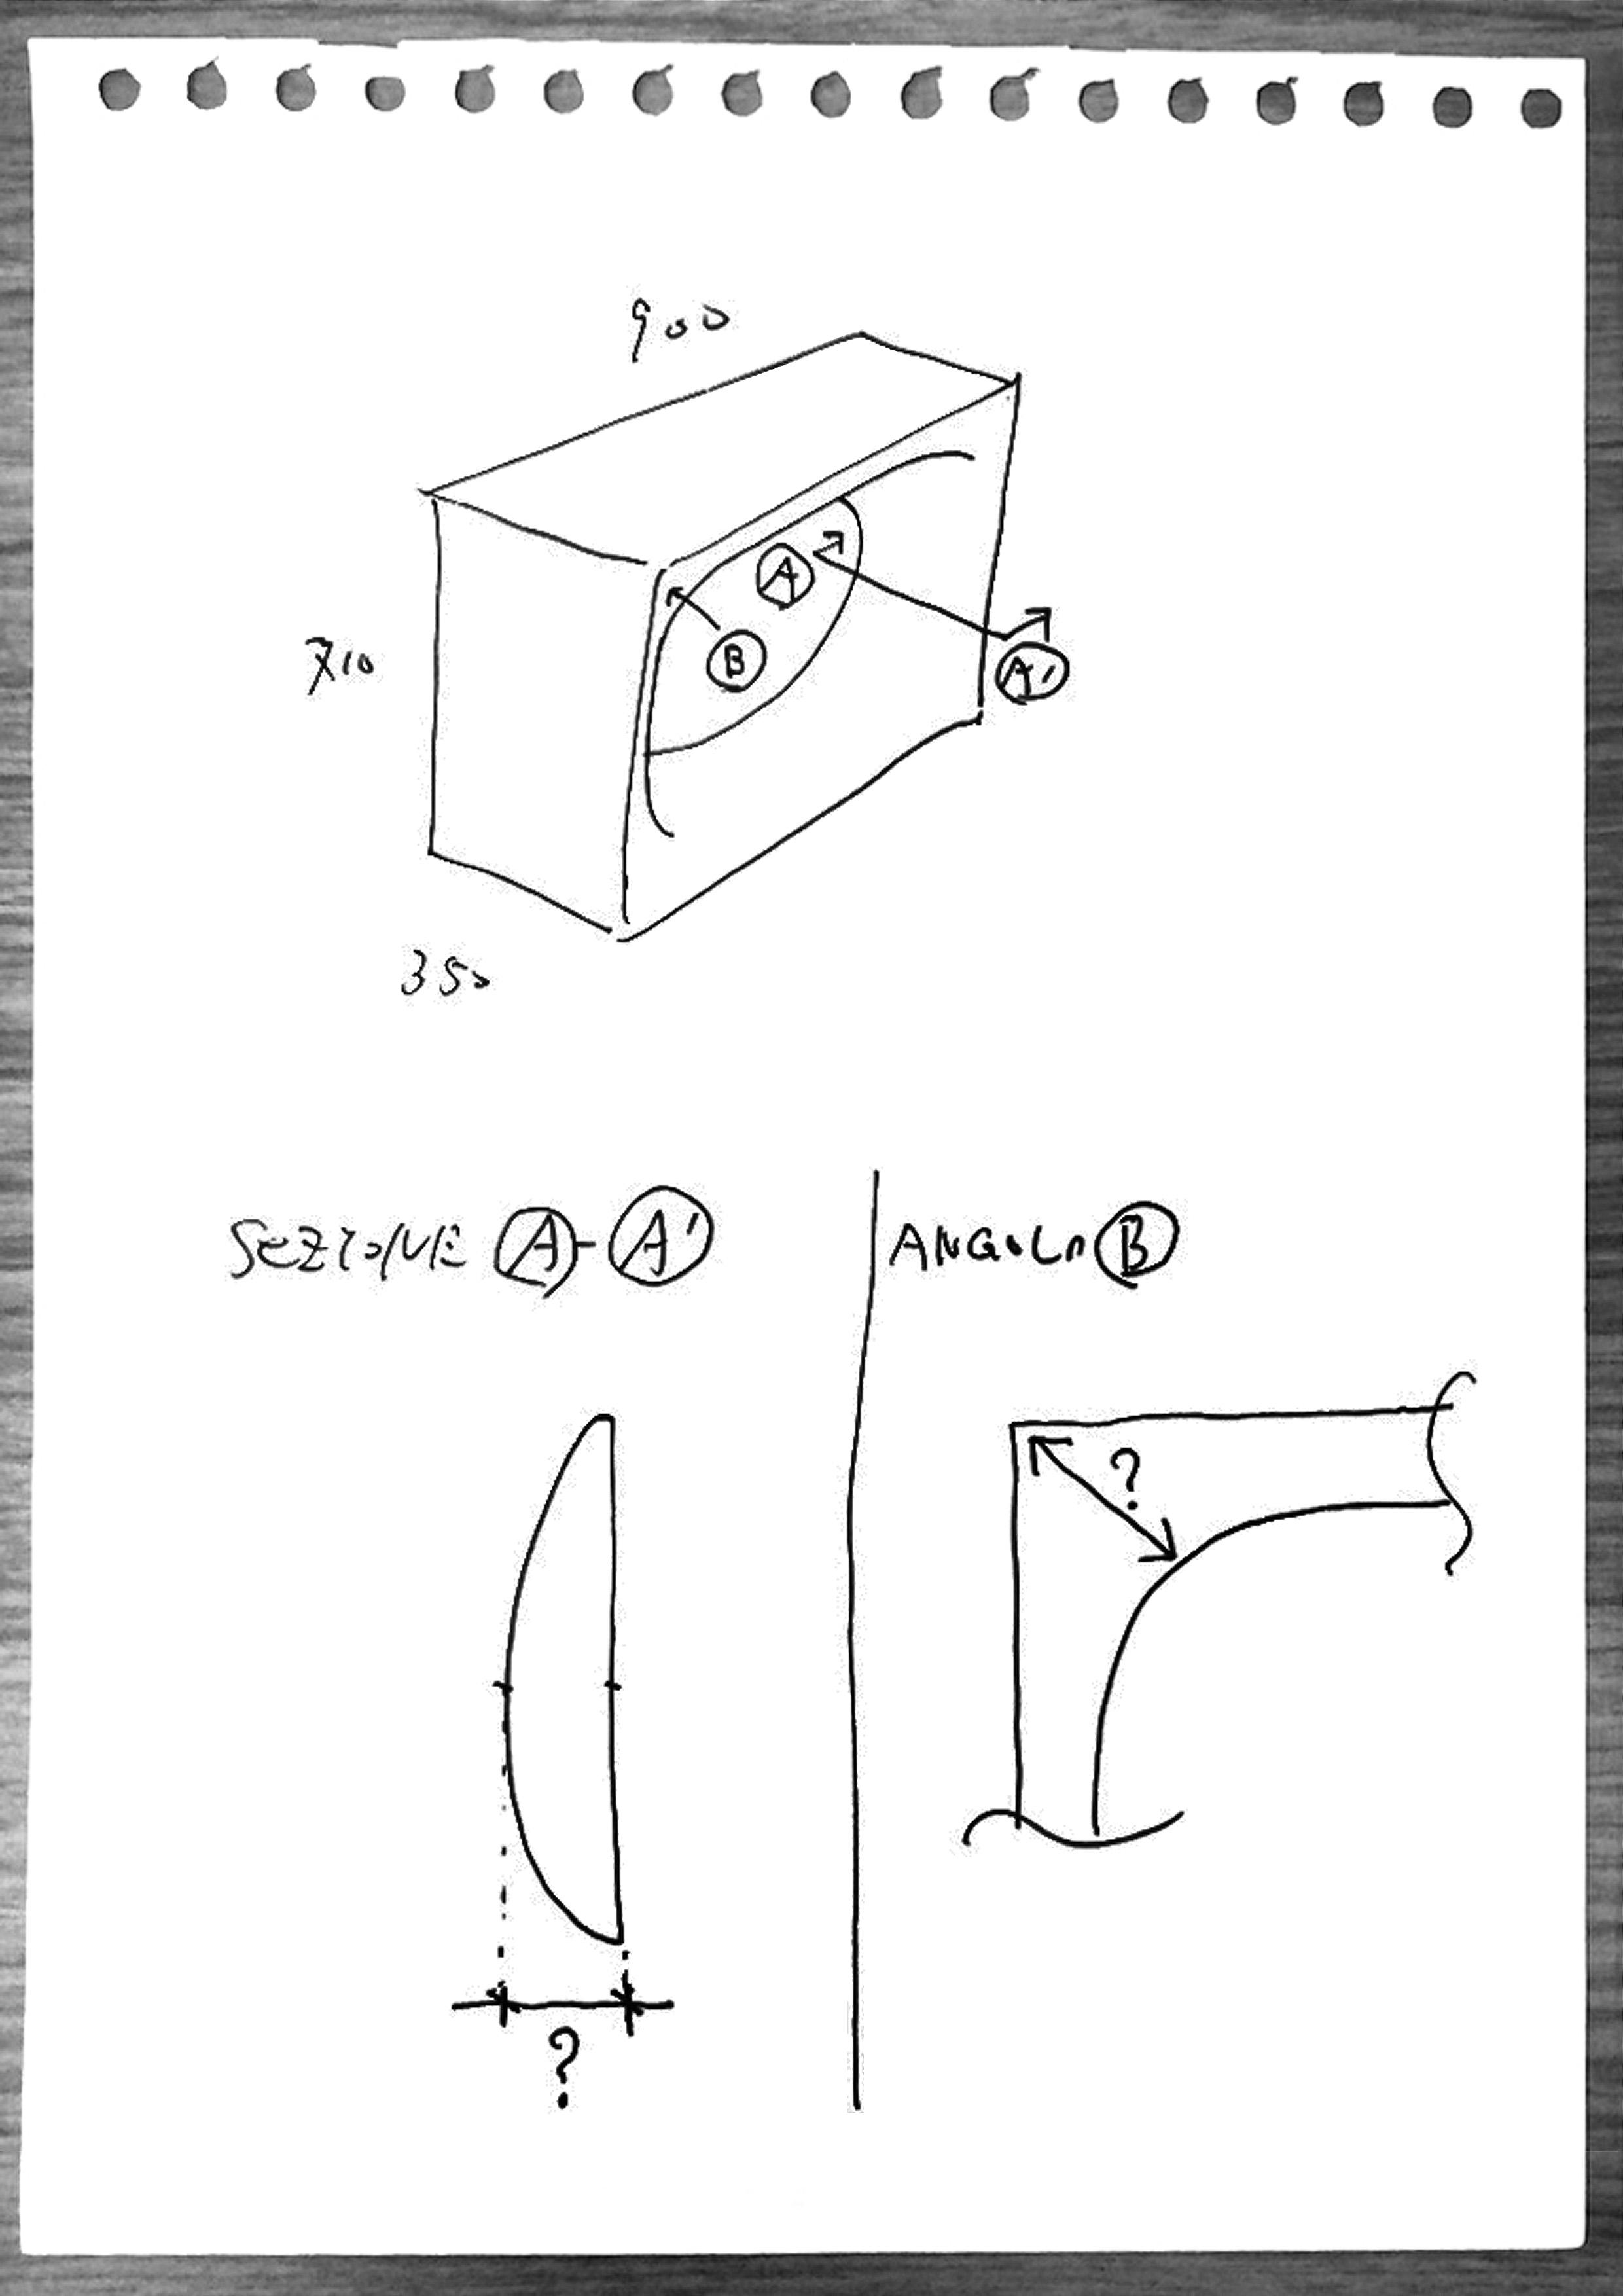 Holo_drawing_2.jpg